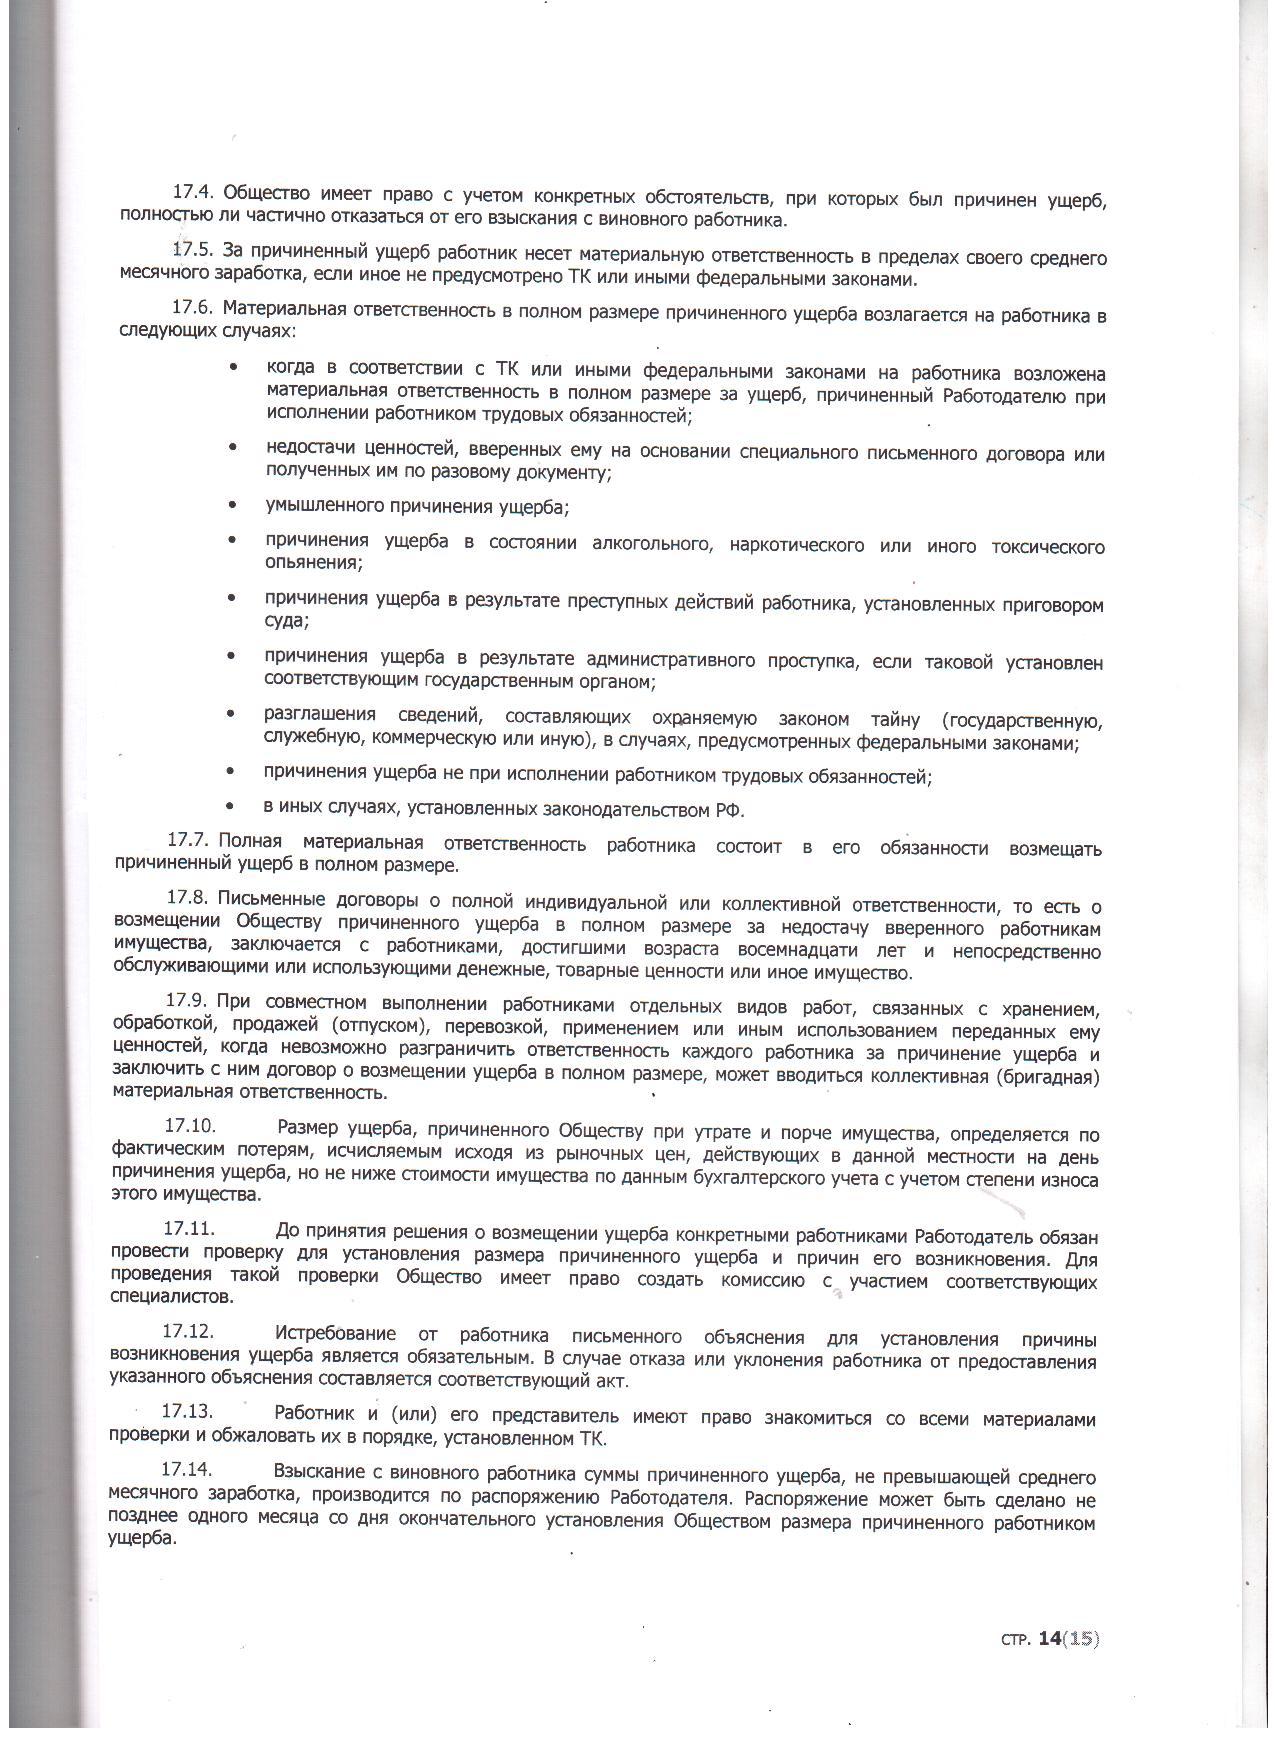 Правила внутреннего трудоговоро распорядка 14